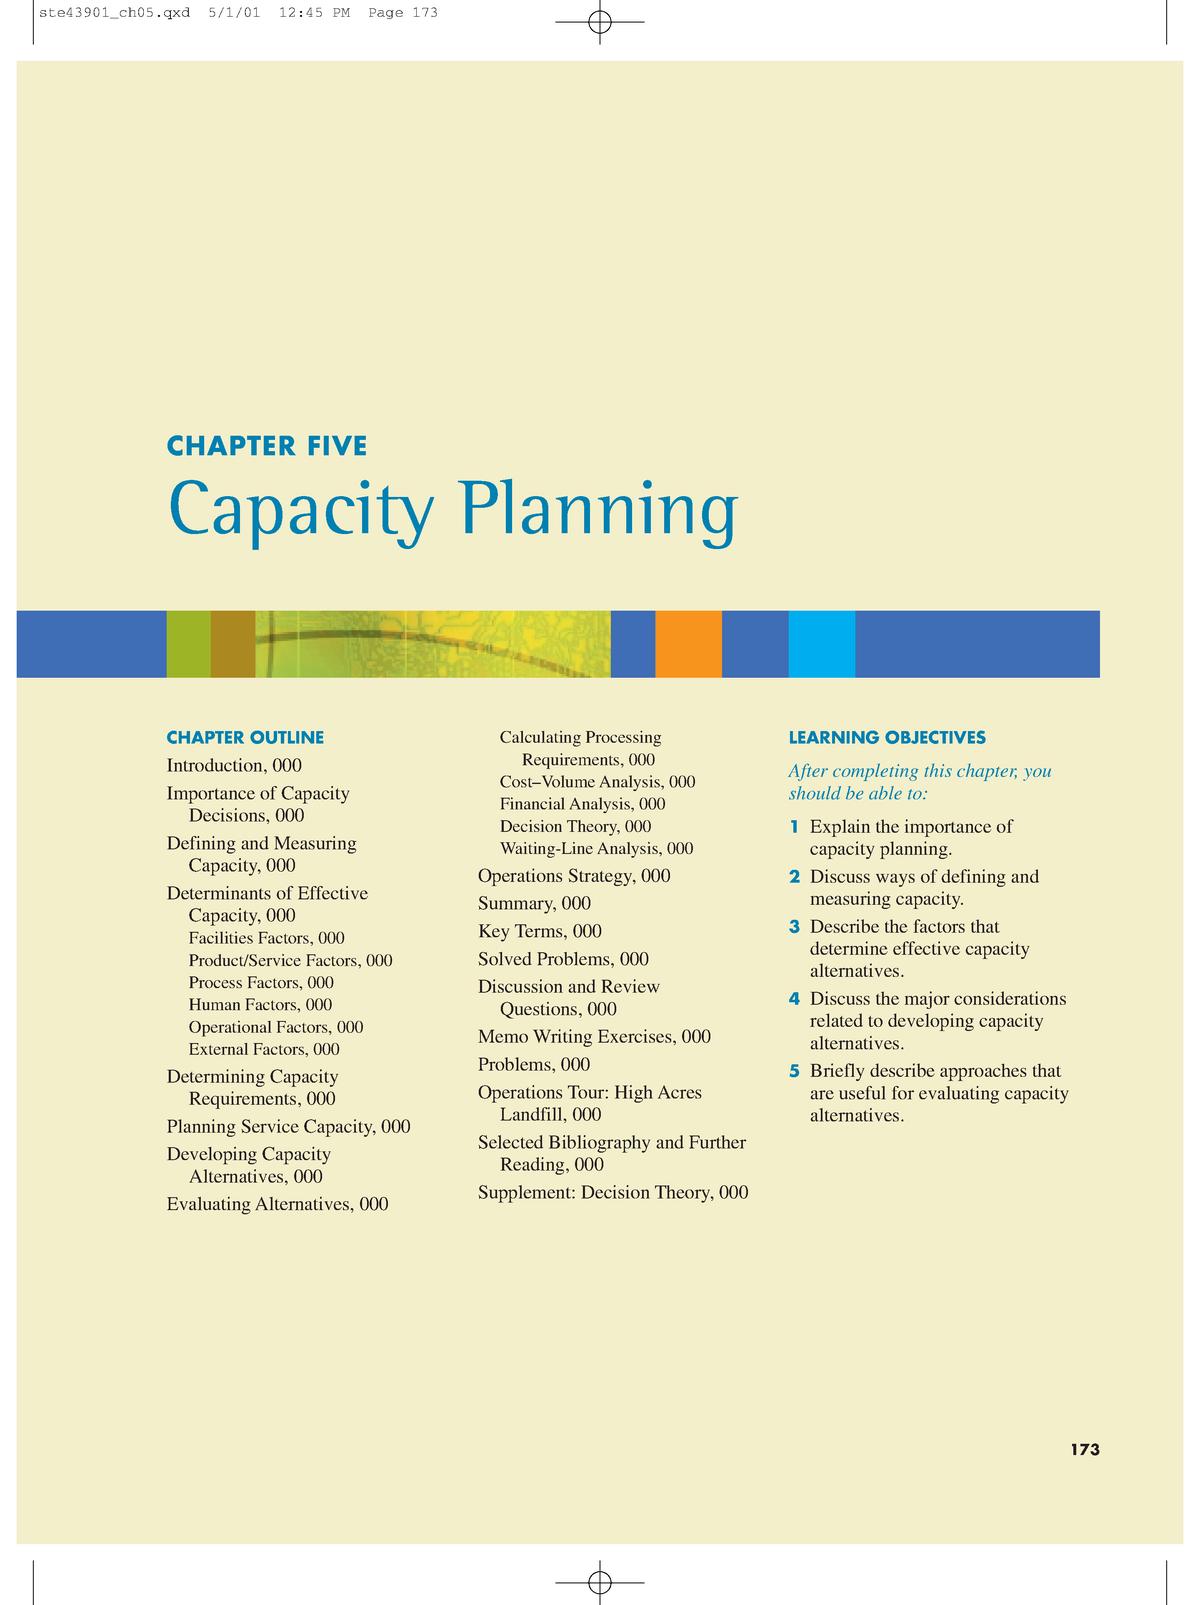 Capacity planning - Alaa - Strength of materials PRE5122